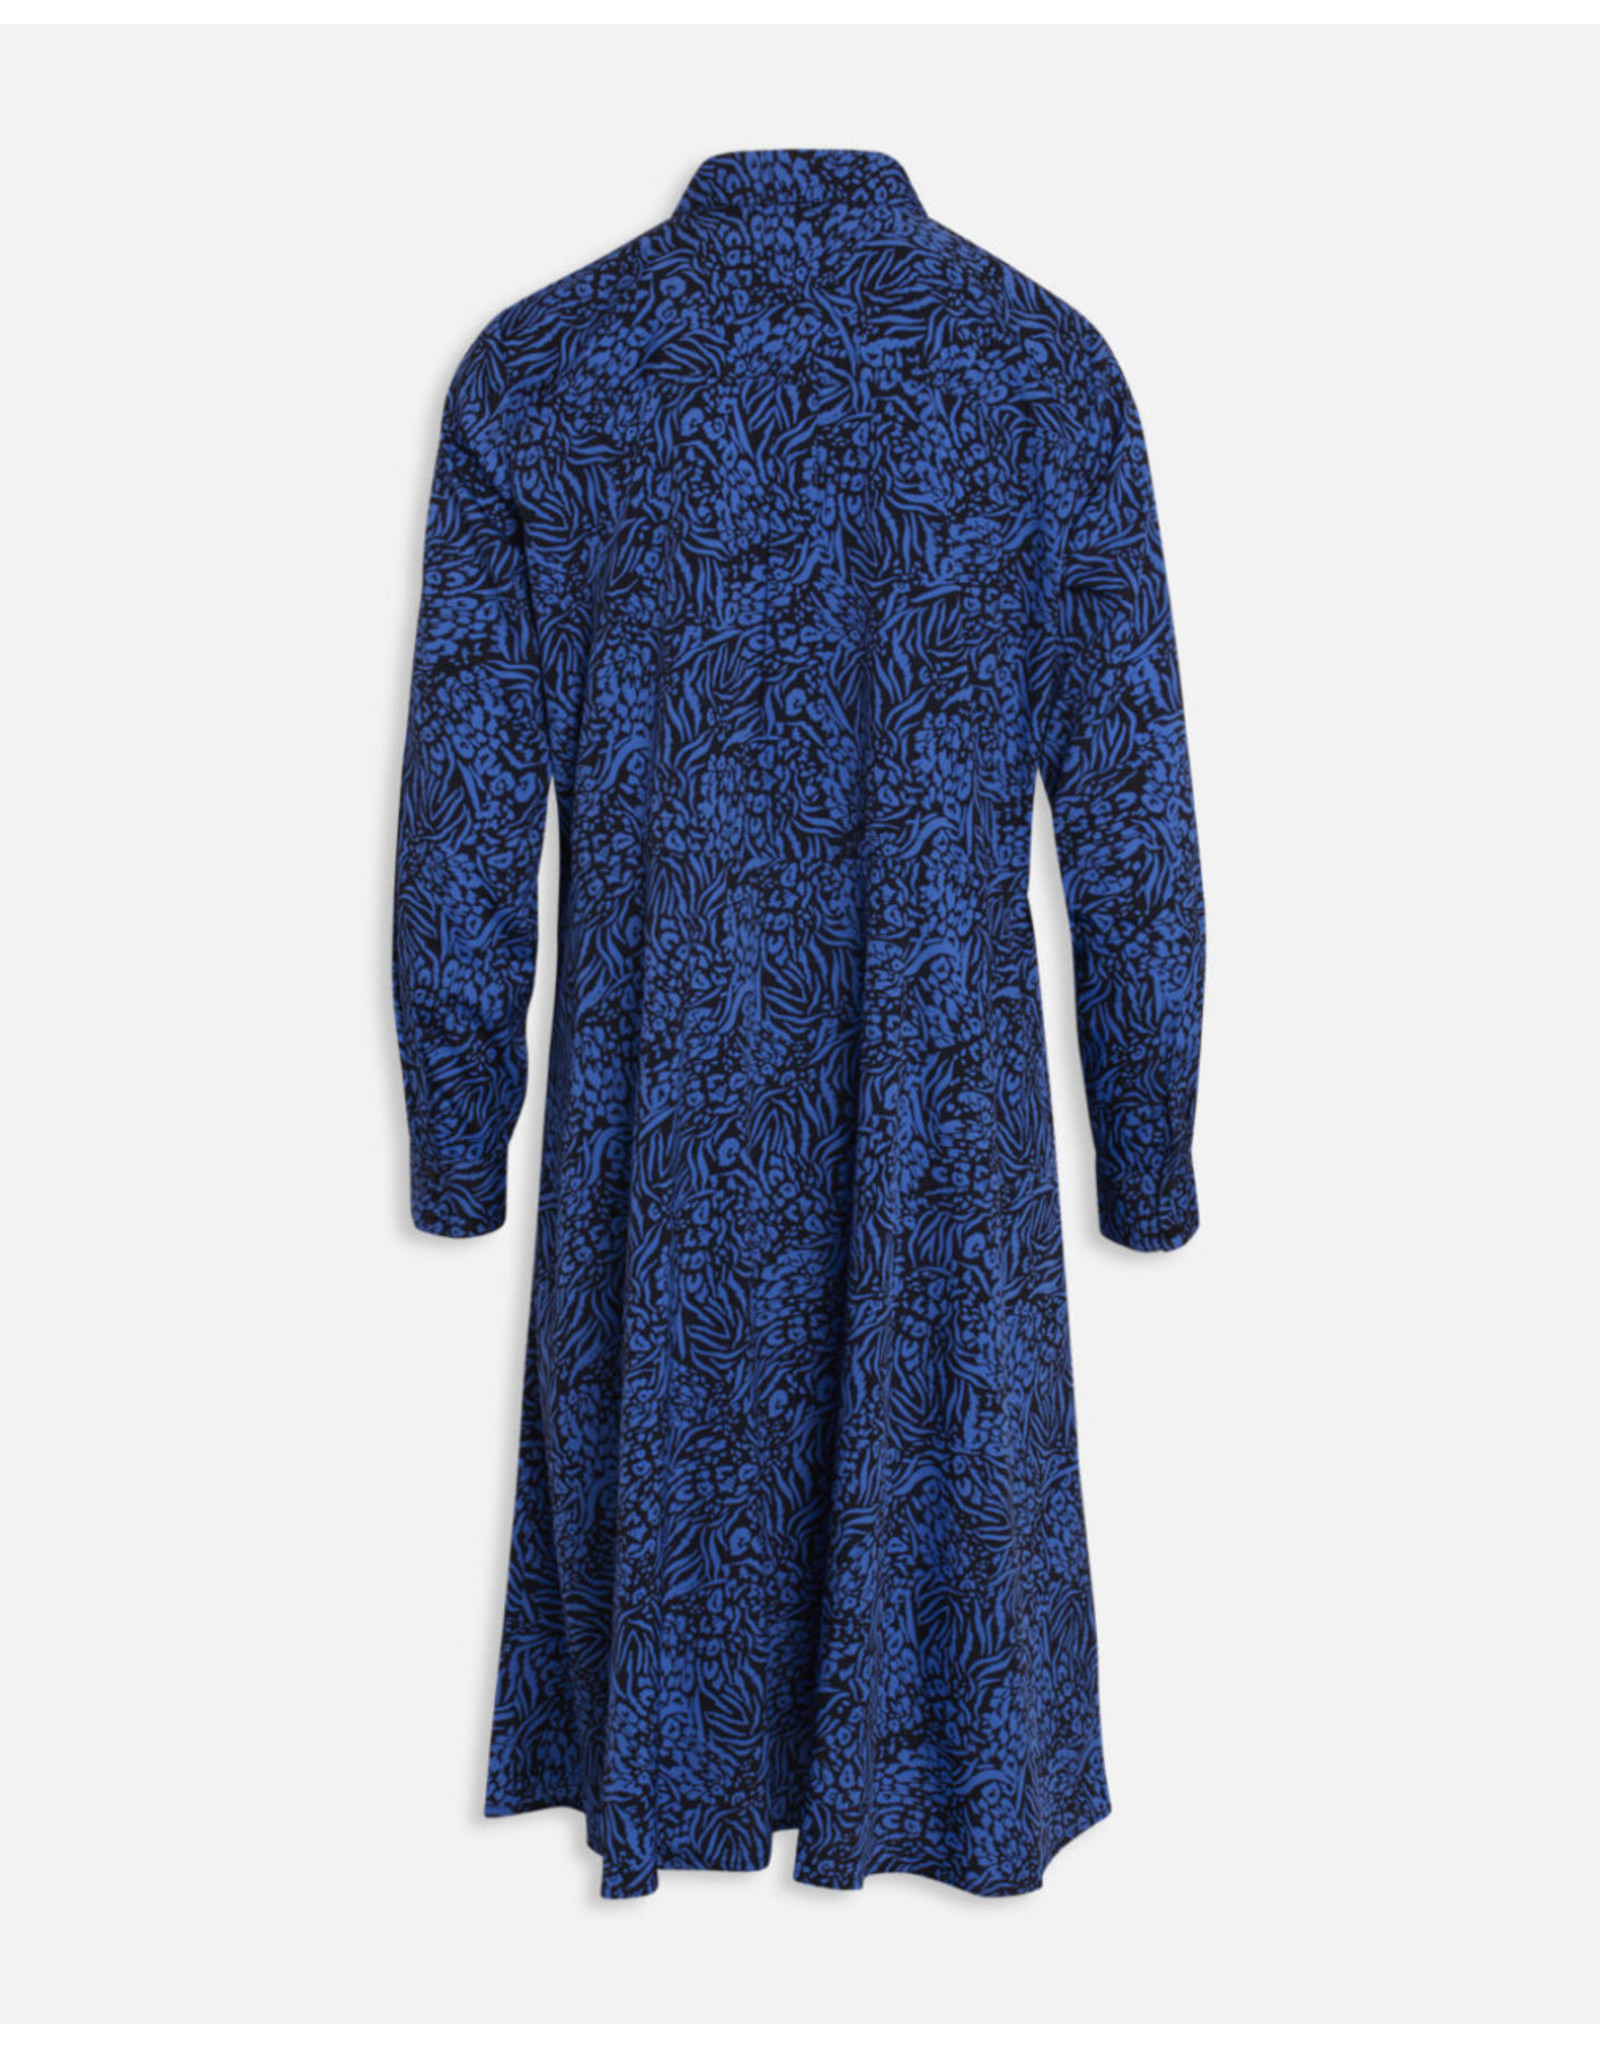 PRINT DRESS BLUE